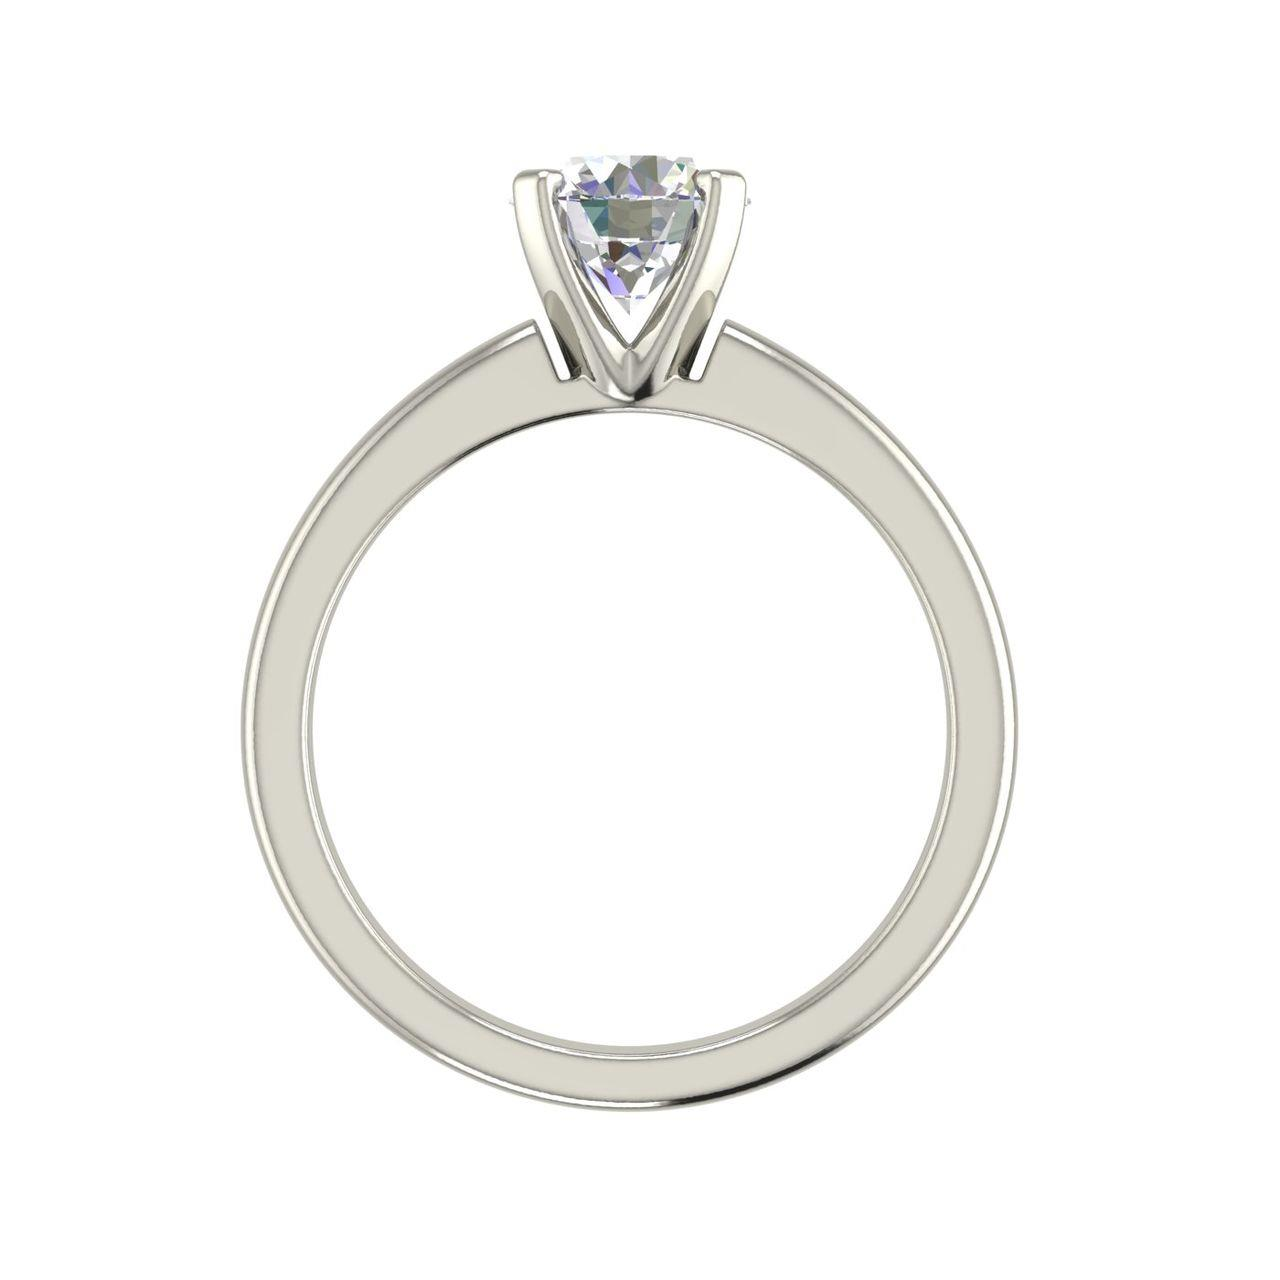 Solitaire 1 Carat Round Cut Diamond Engagement Ring 1